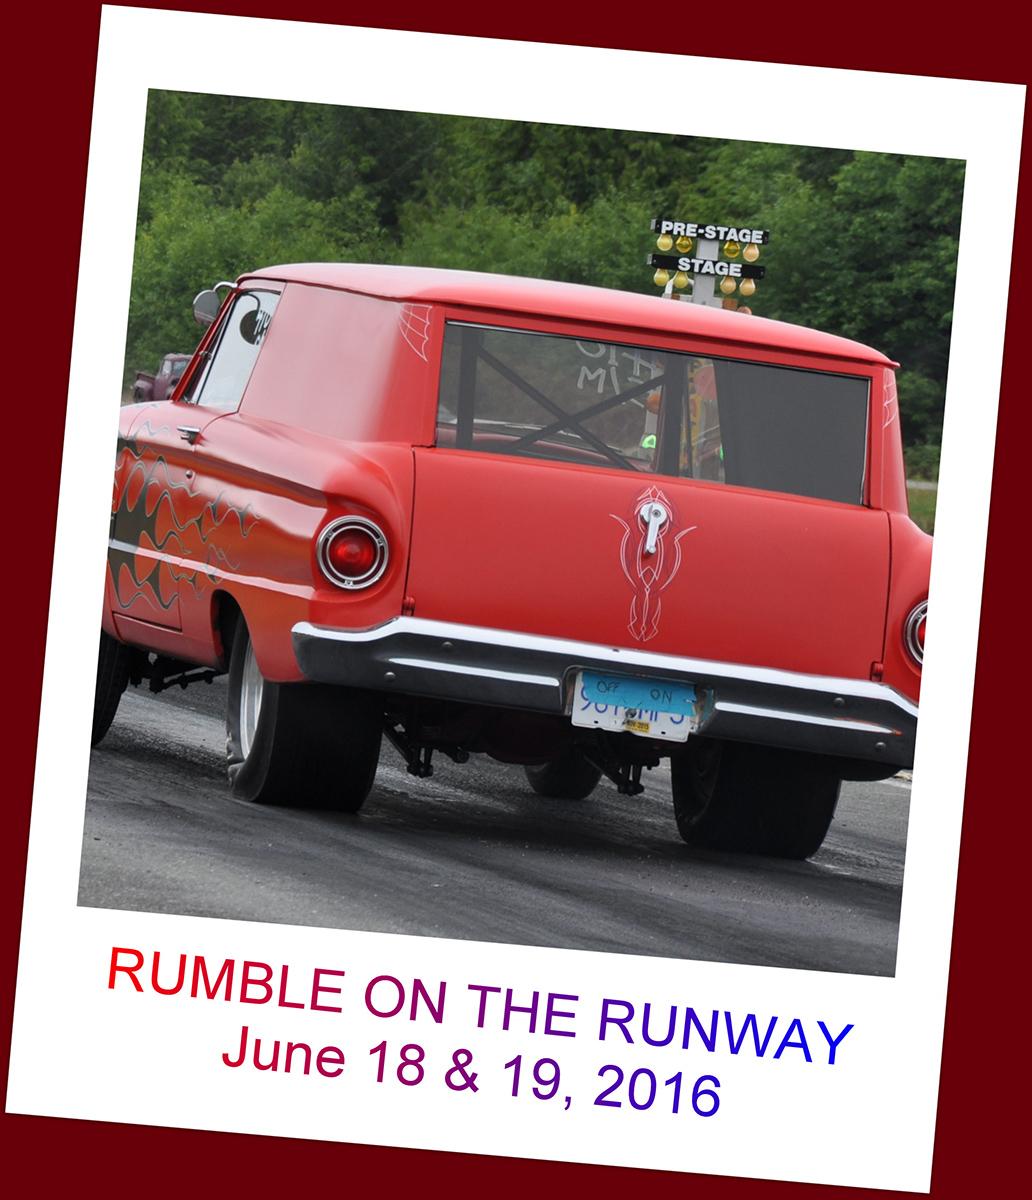 Rumble on the Runway June 18 & 19, 2016 1069